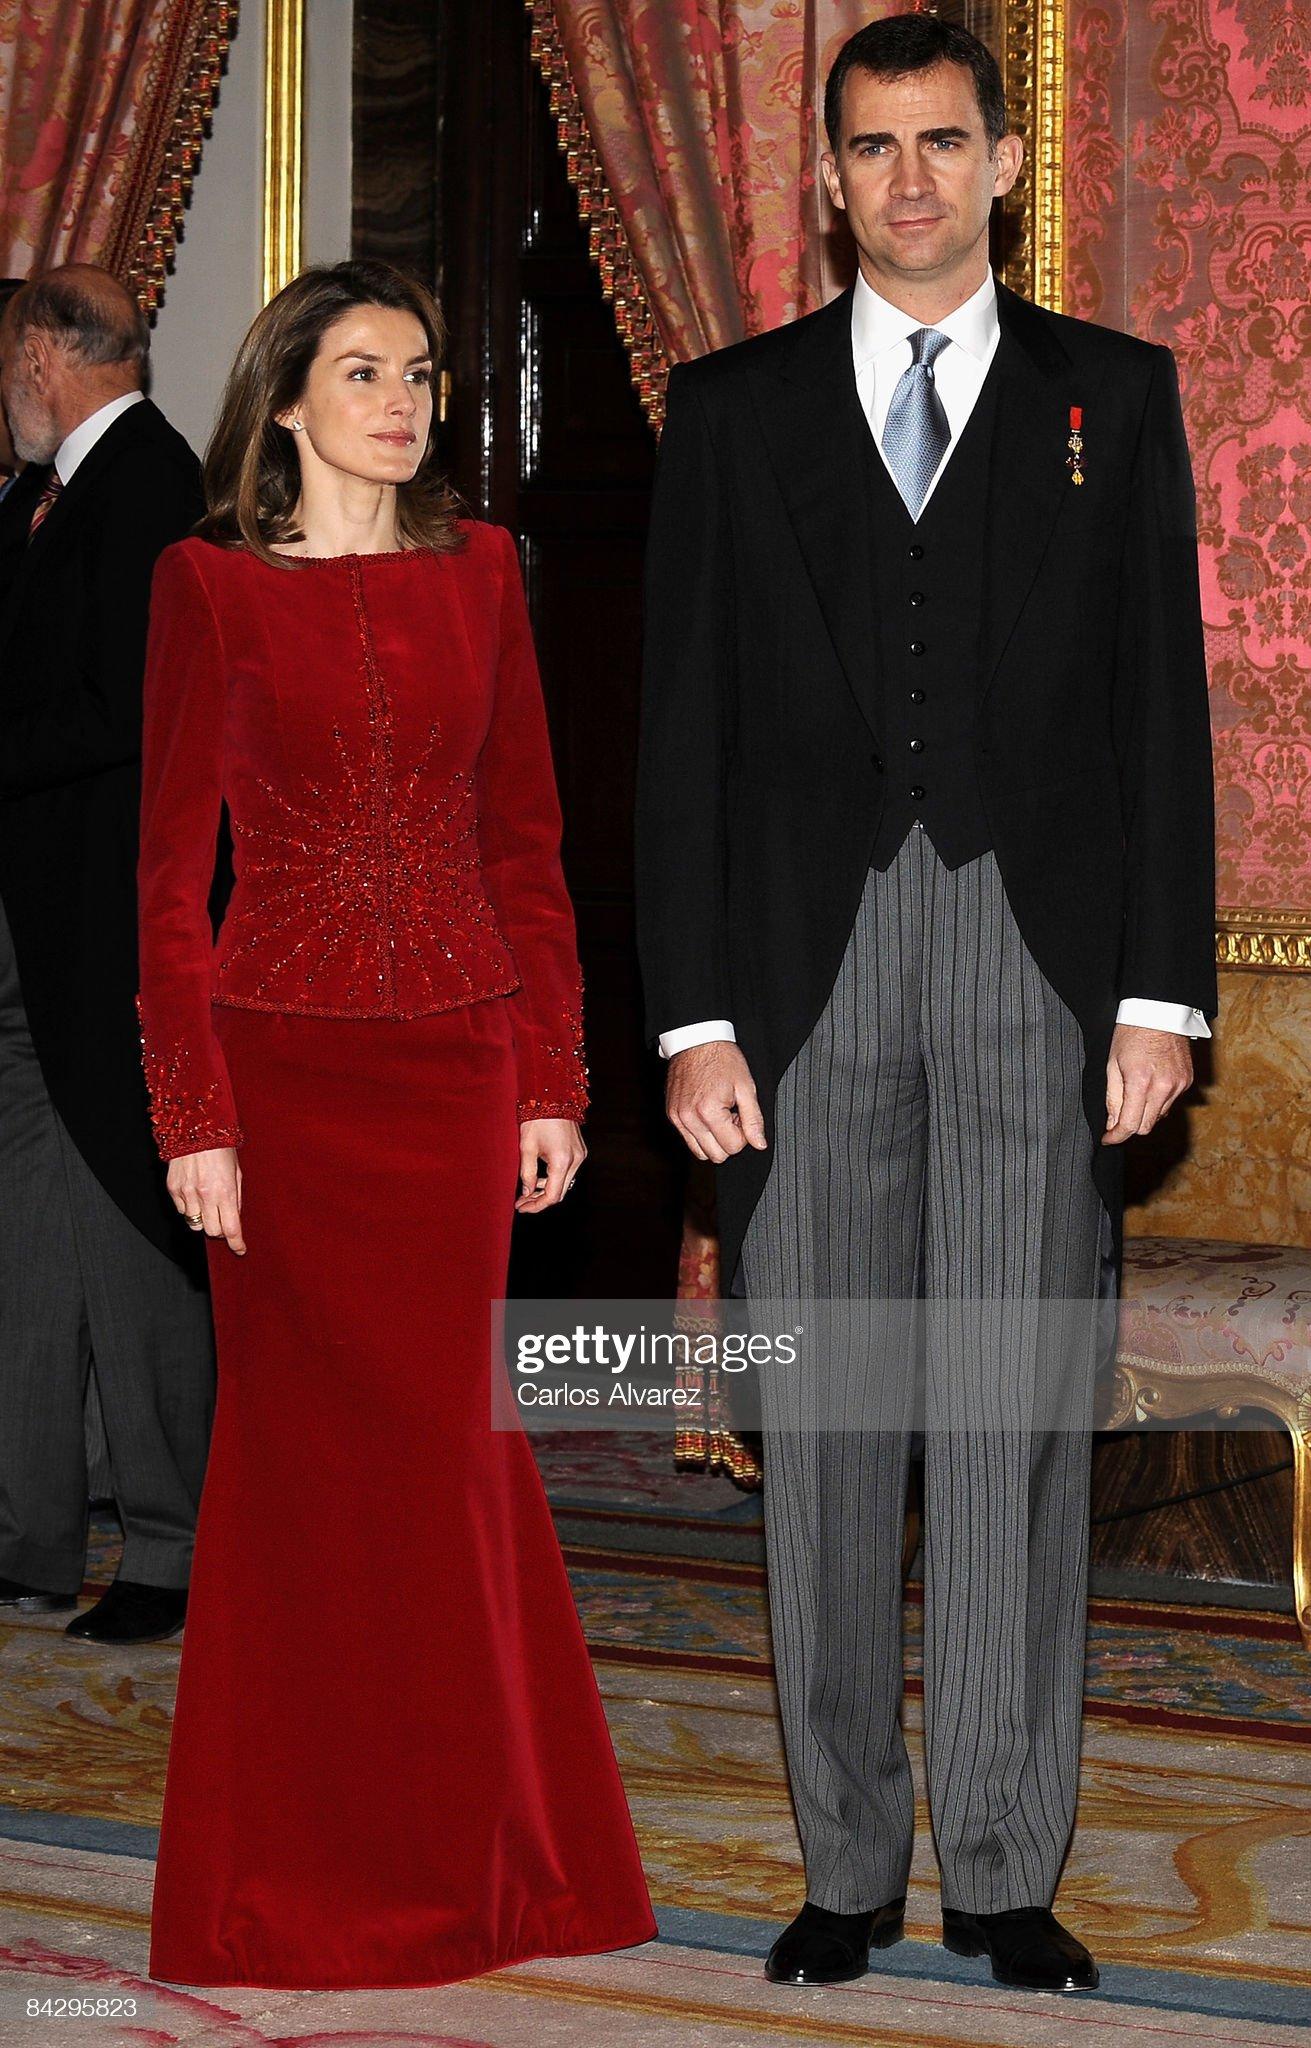 Вечерние наряды Королевы Летиции Spanish Royals Attend Zarzuela Palace : News Photo